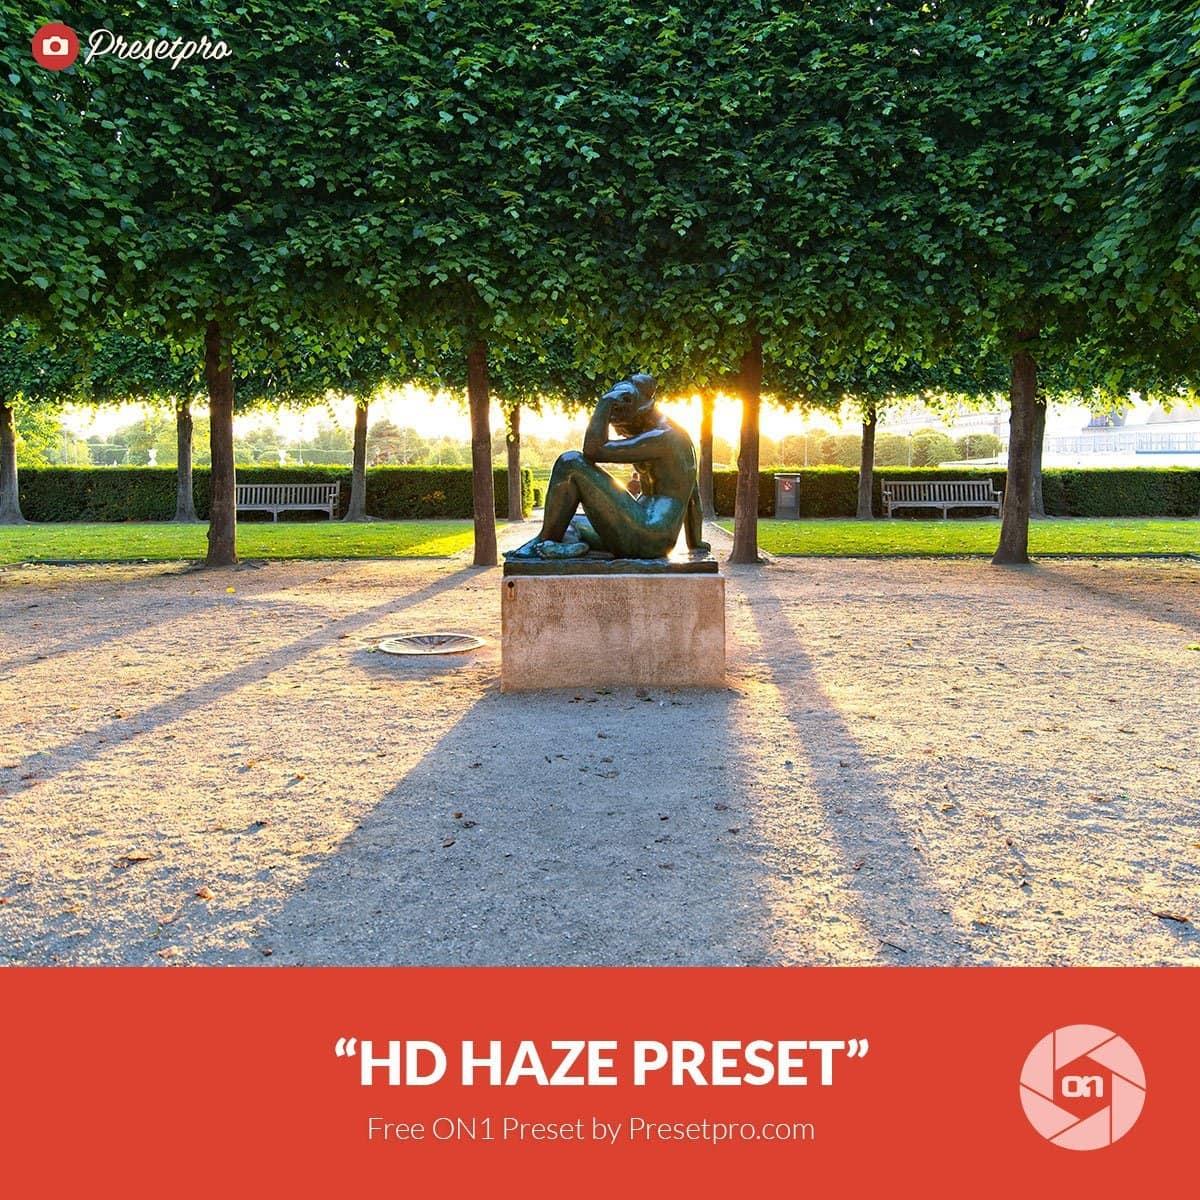 Free-On1-Preset-HD-Haze-Presetpro.com